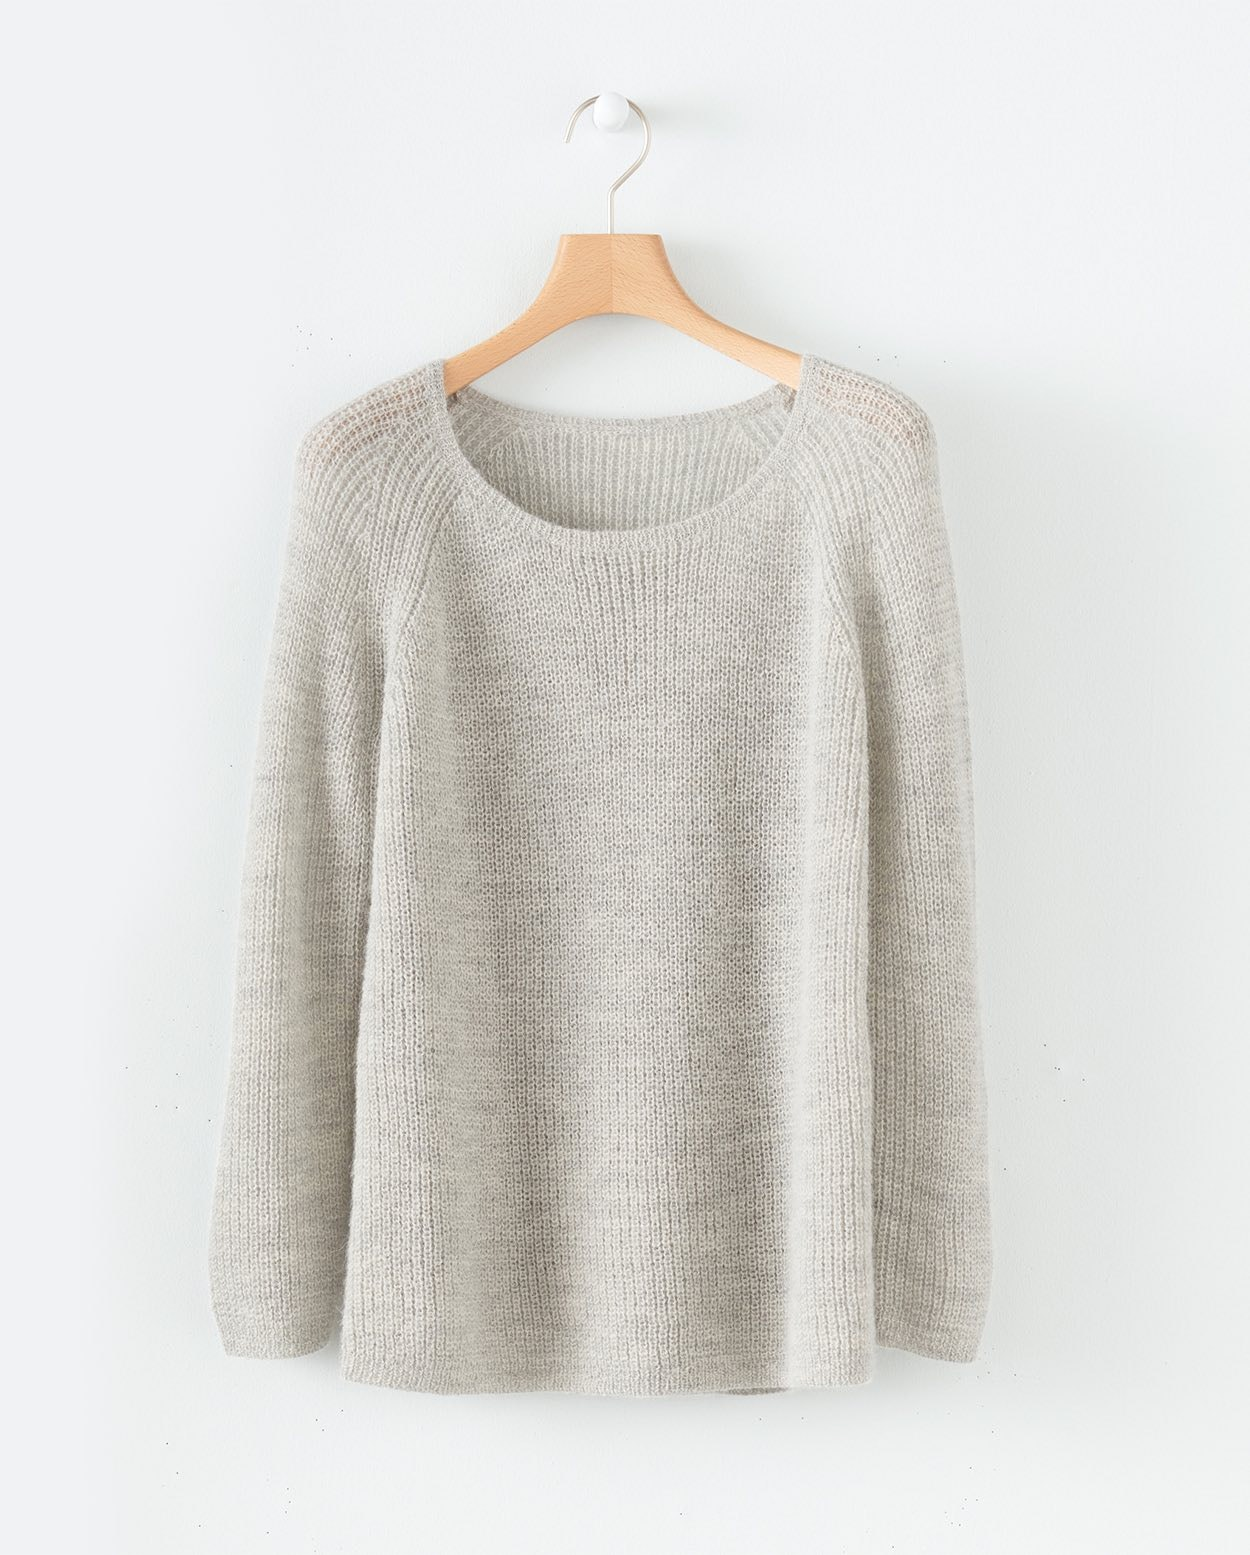 e4366579e4b5 Poetry - Baby alpaca ribbed knit sweater